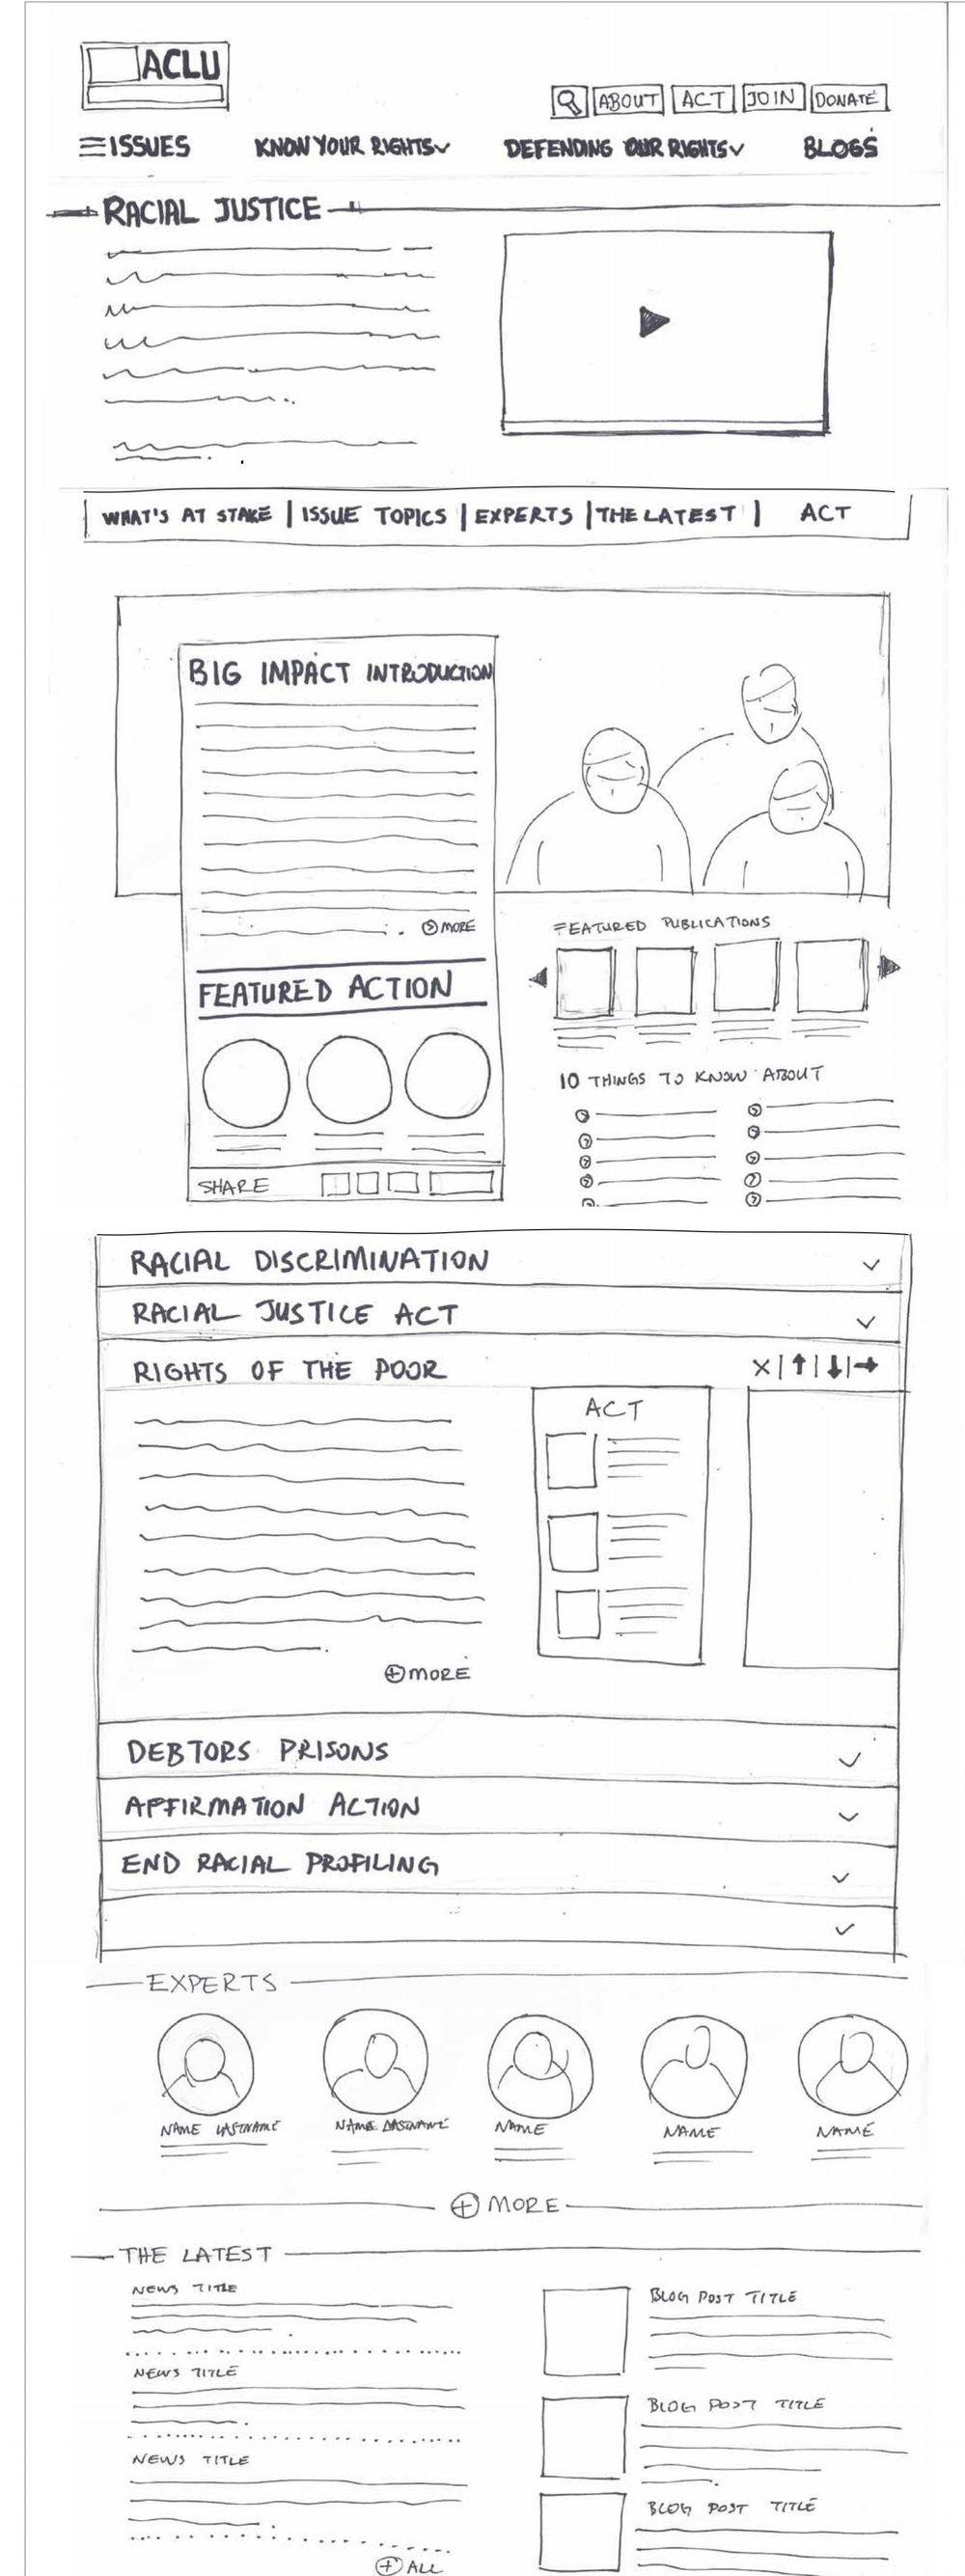 ACLU_Wireframe_Sketches.jpg